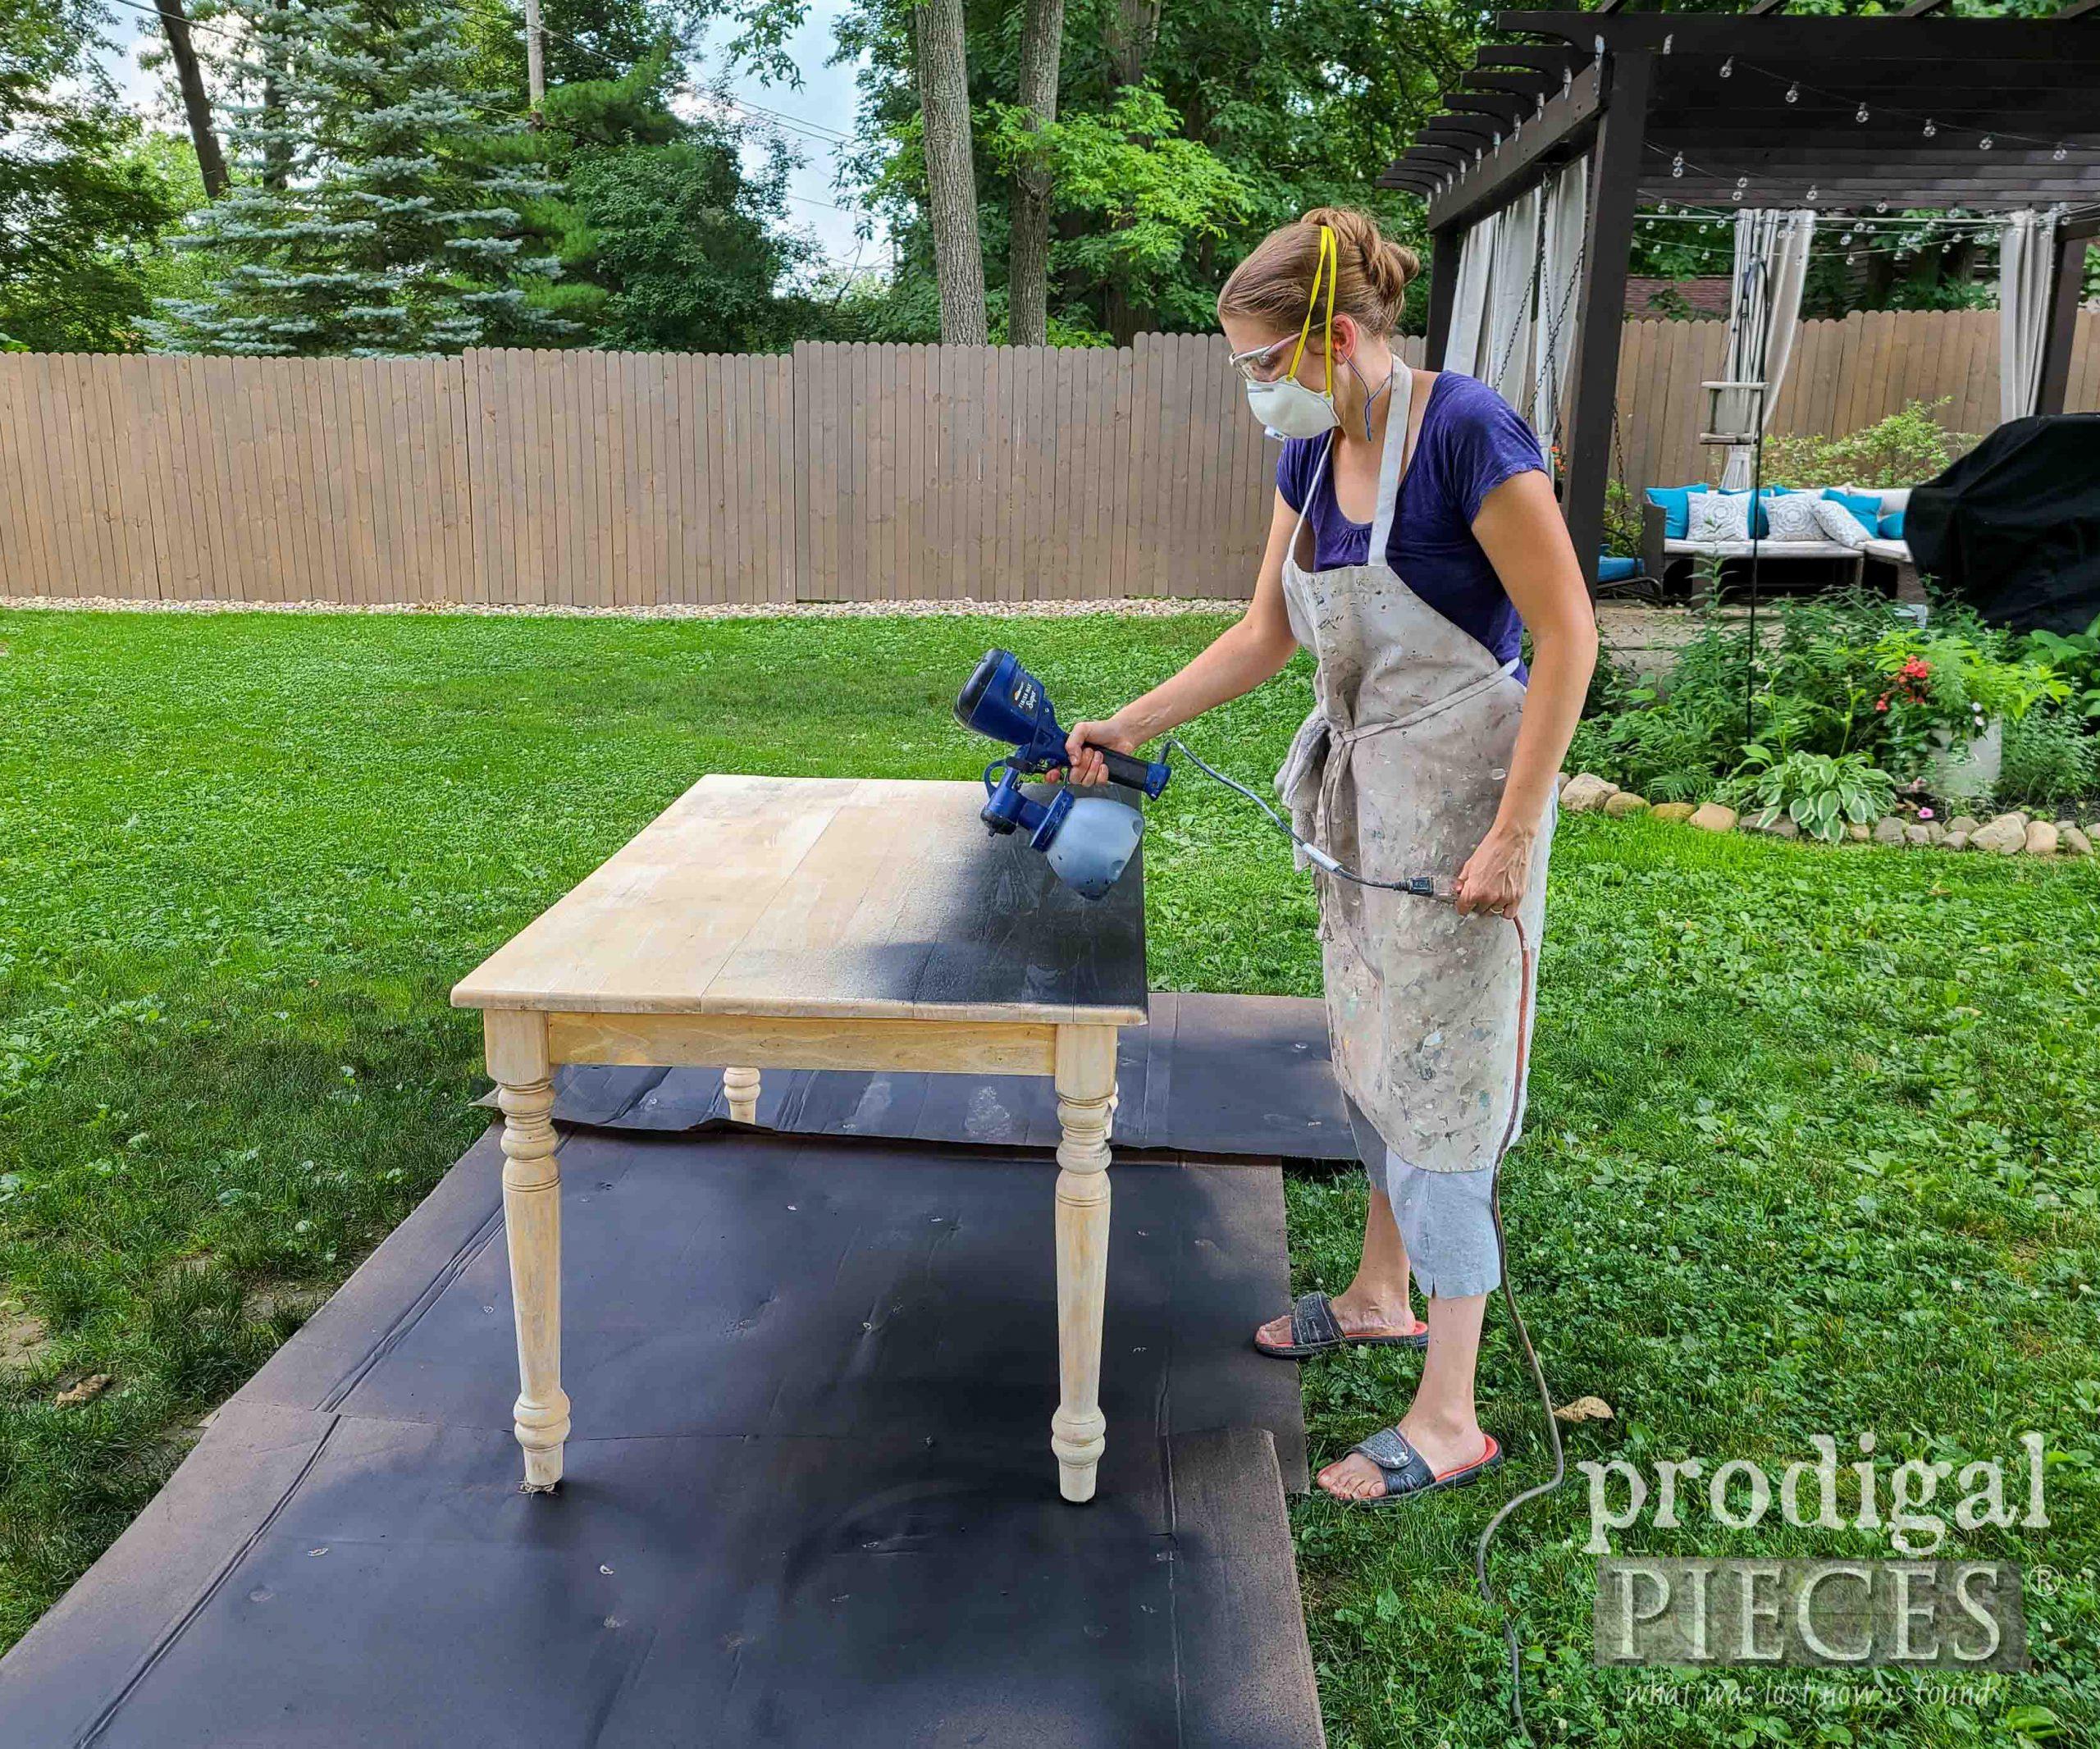 Larissa of Prodigal Pieces Spray Painting Farmhouse Dining Table | prodigalpieces.com #prodigalpieces #furniture #diy #farmhouse